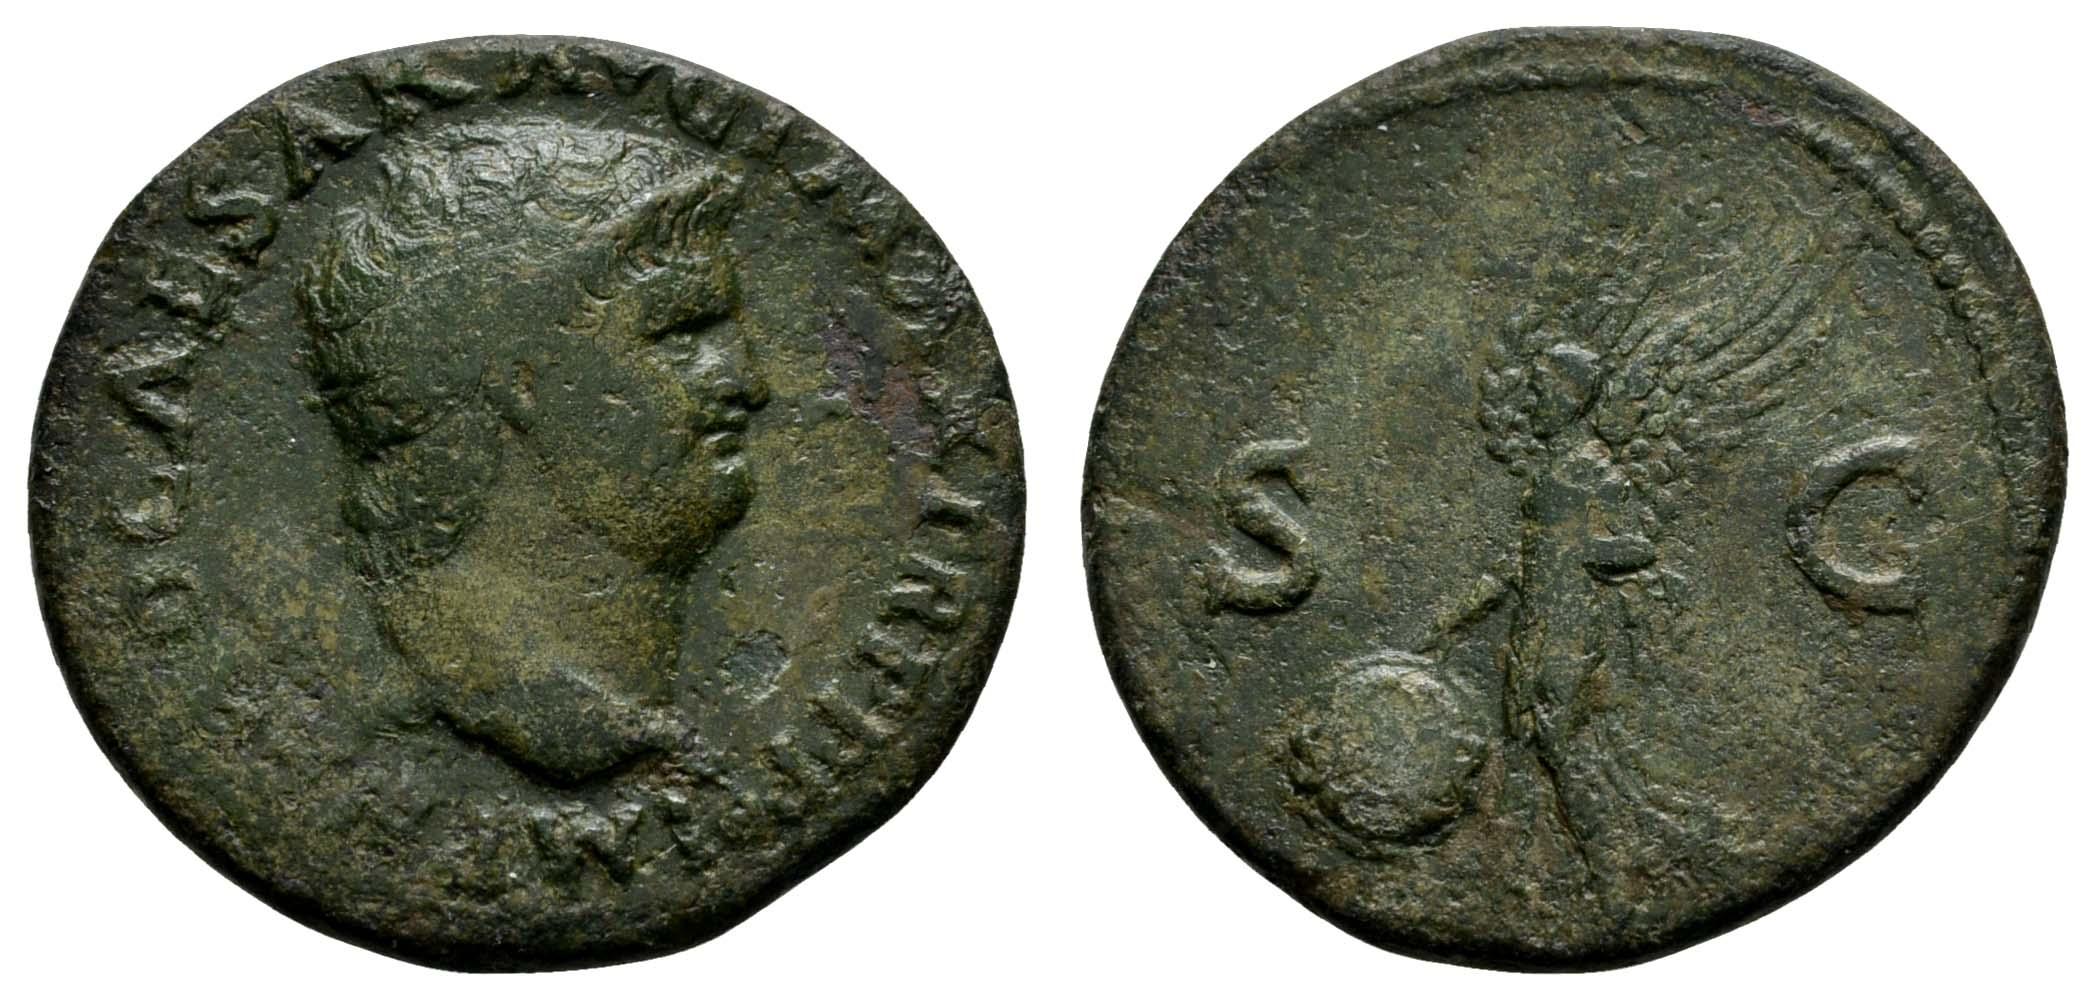 Lot 136 - Antike Römer - Kaiserzeit -  Auktionshaus Ulrich Felzmann GmbH & Co. KG Coins single lots